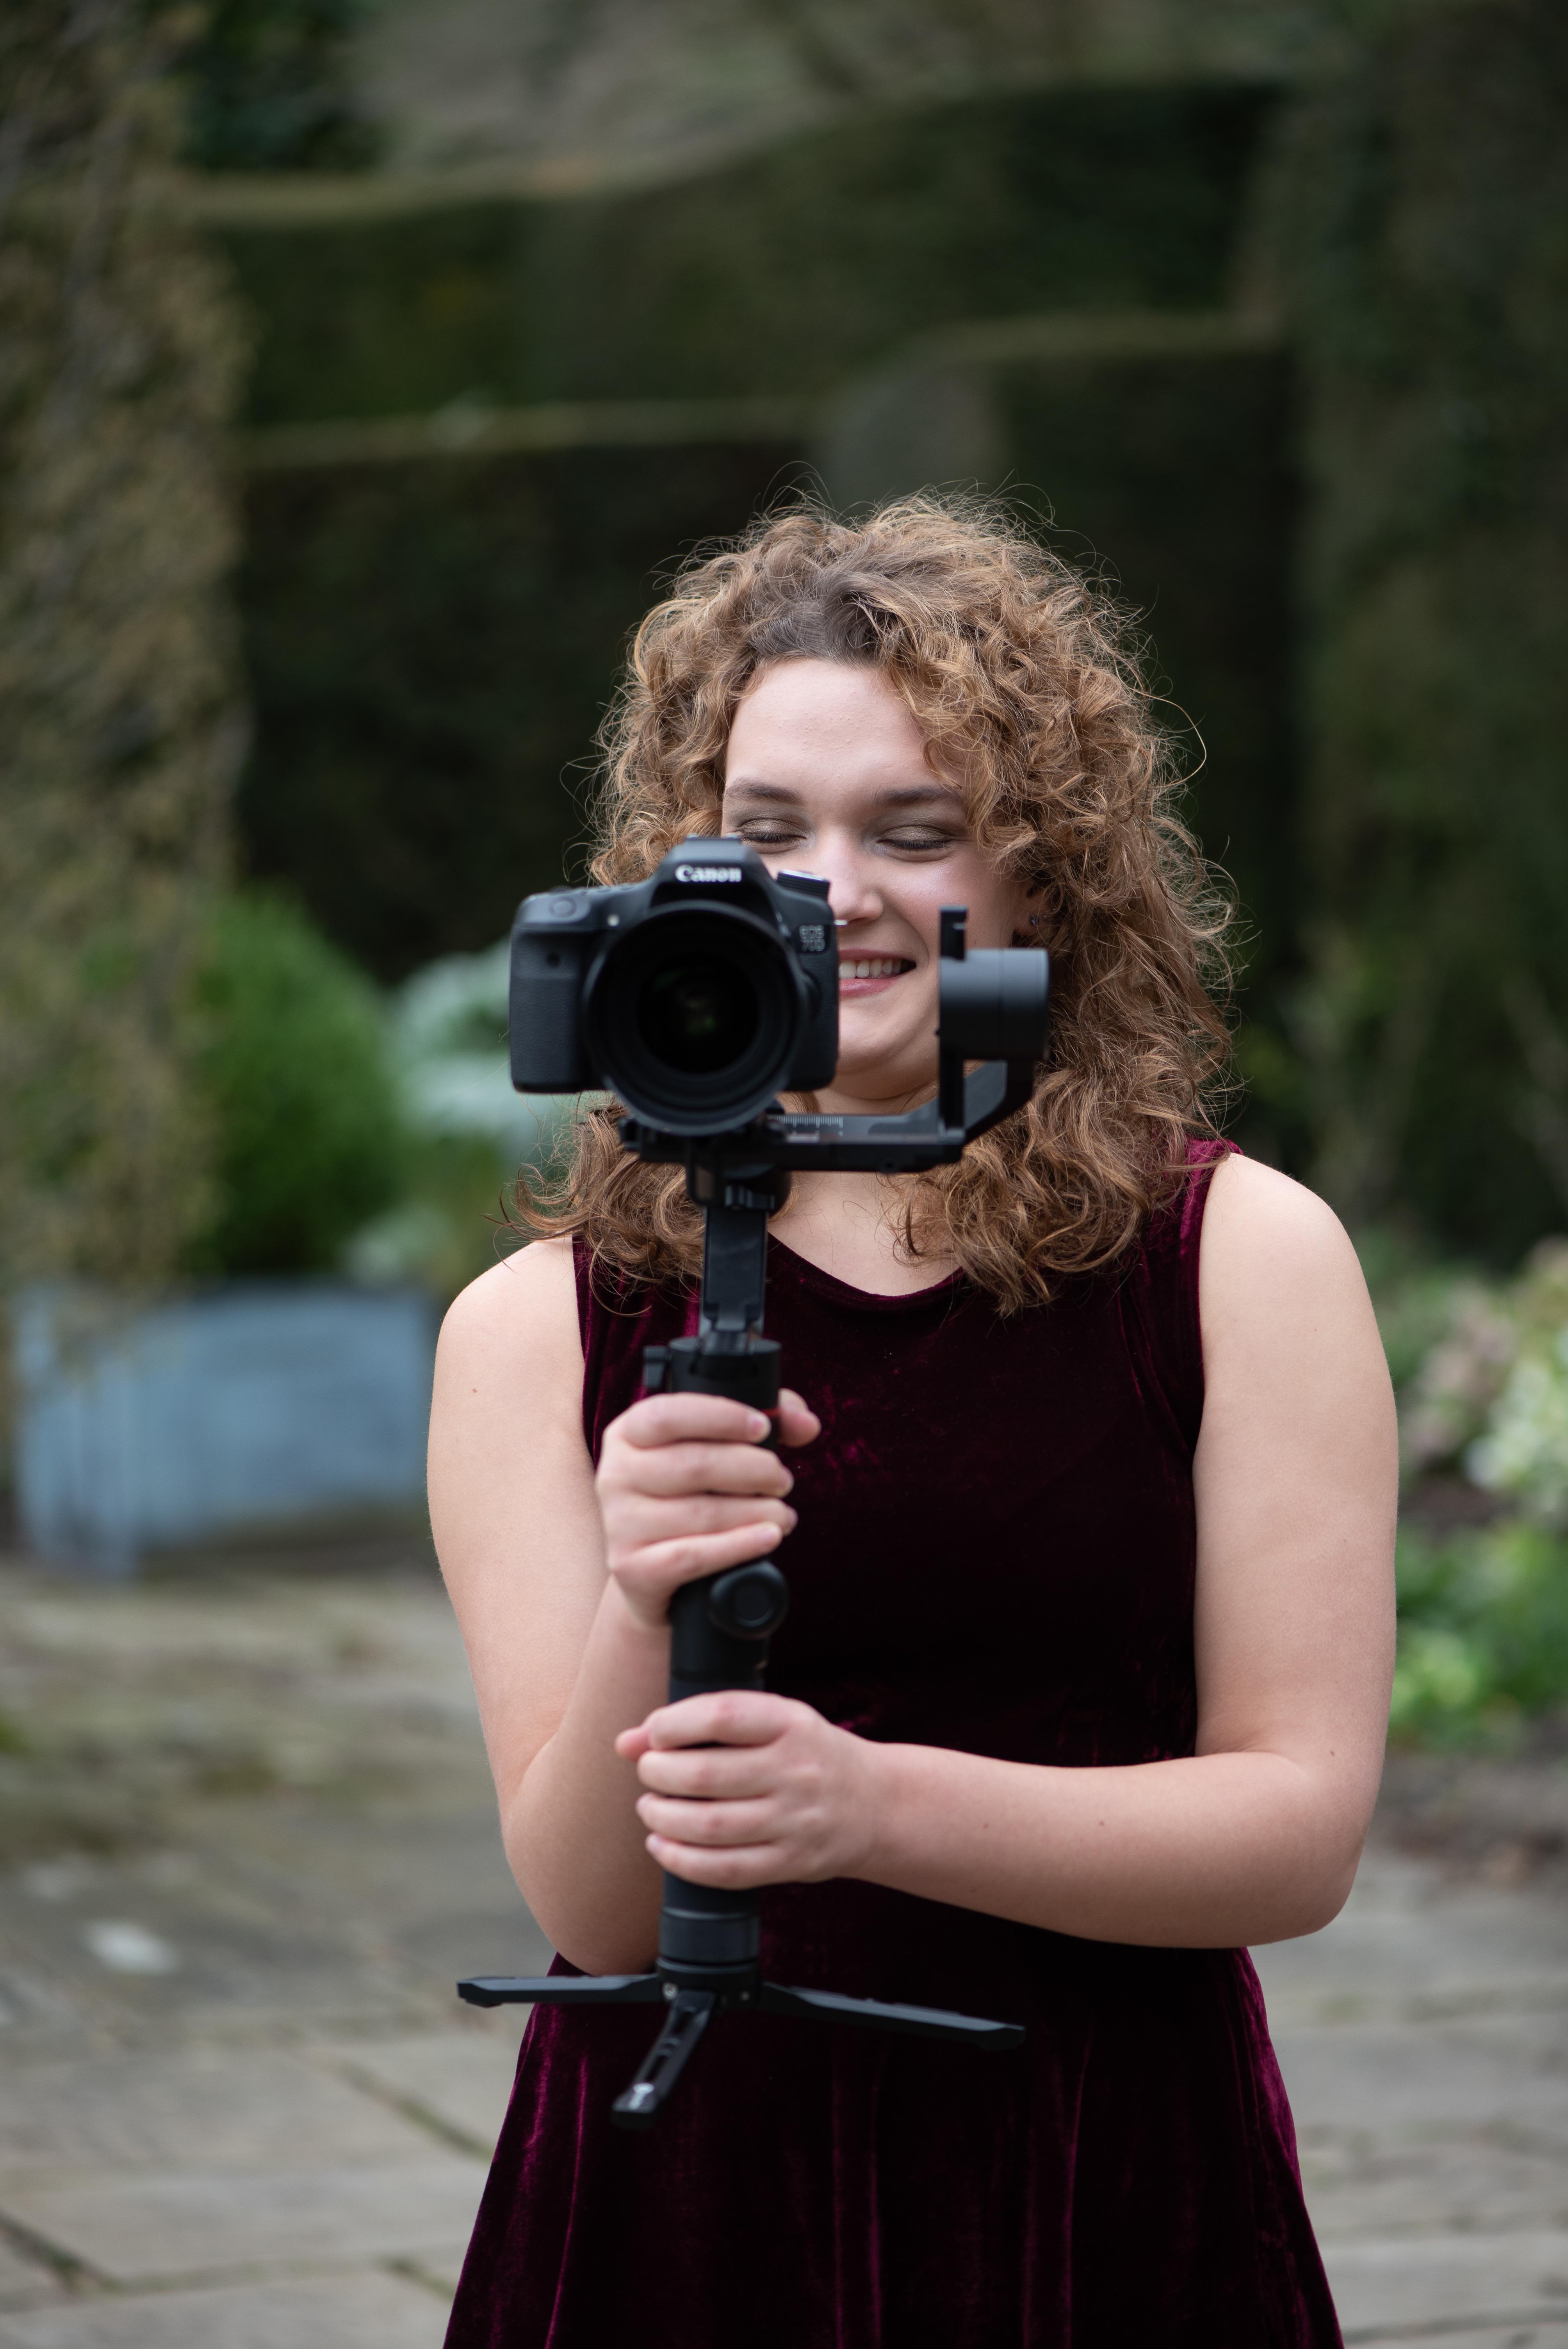 Karina, harpist holding a video camera